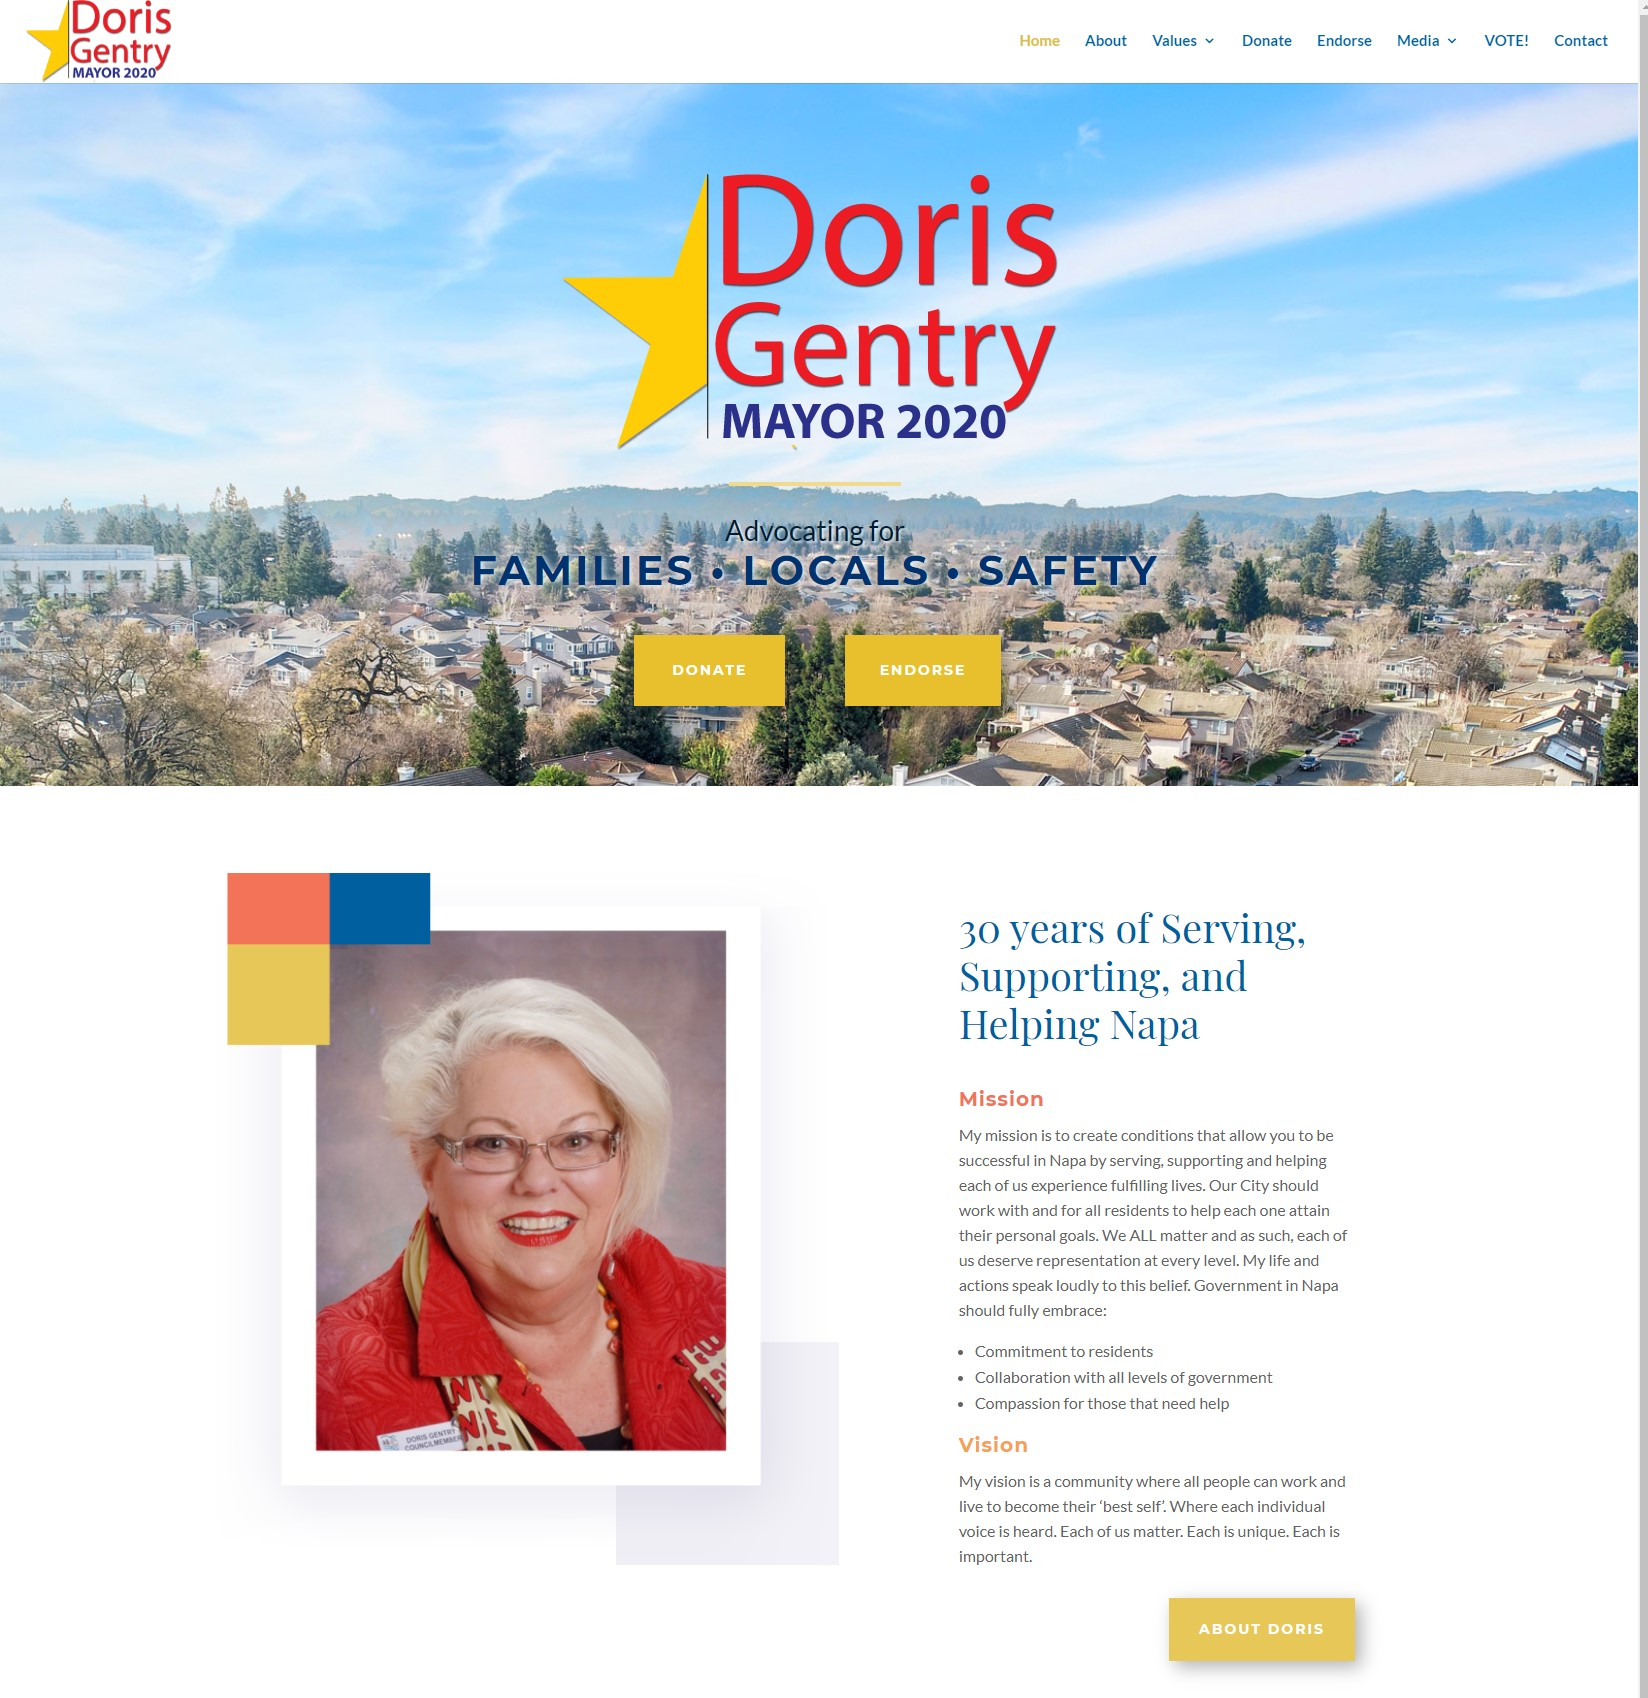 Doris Gentry